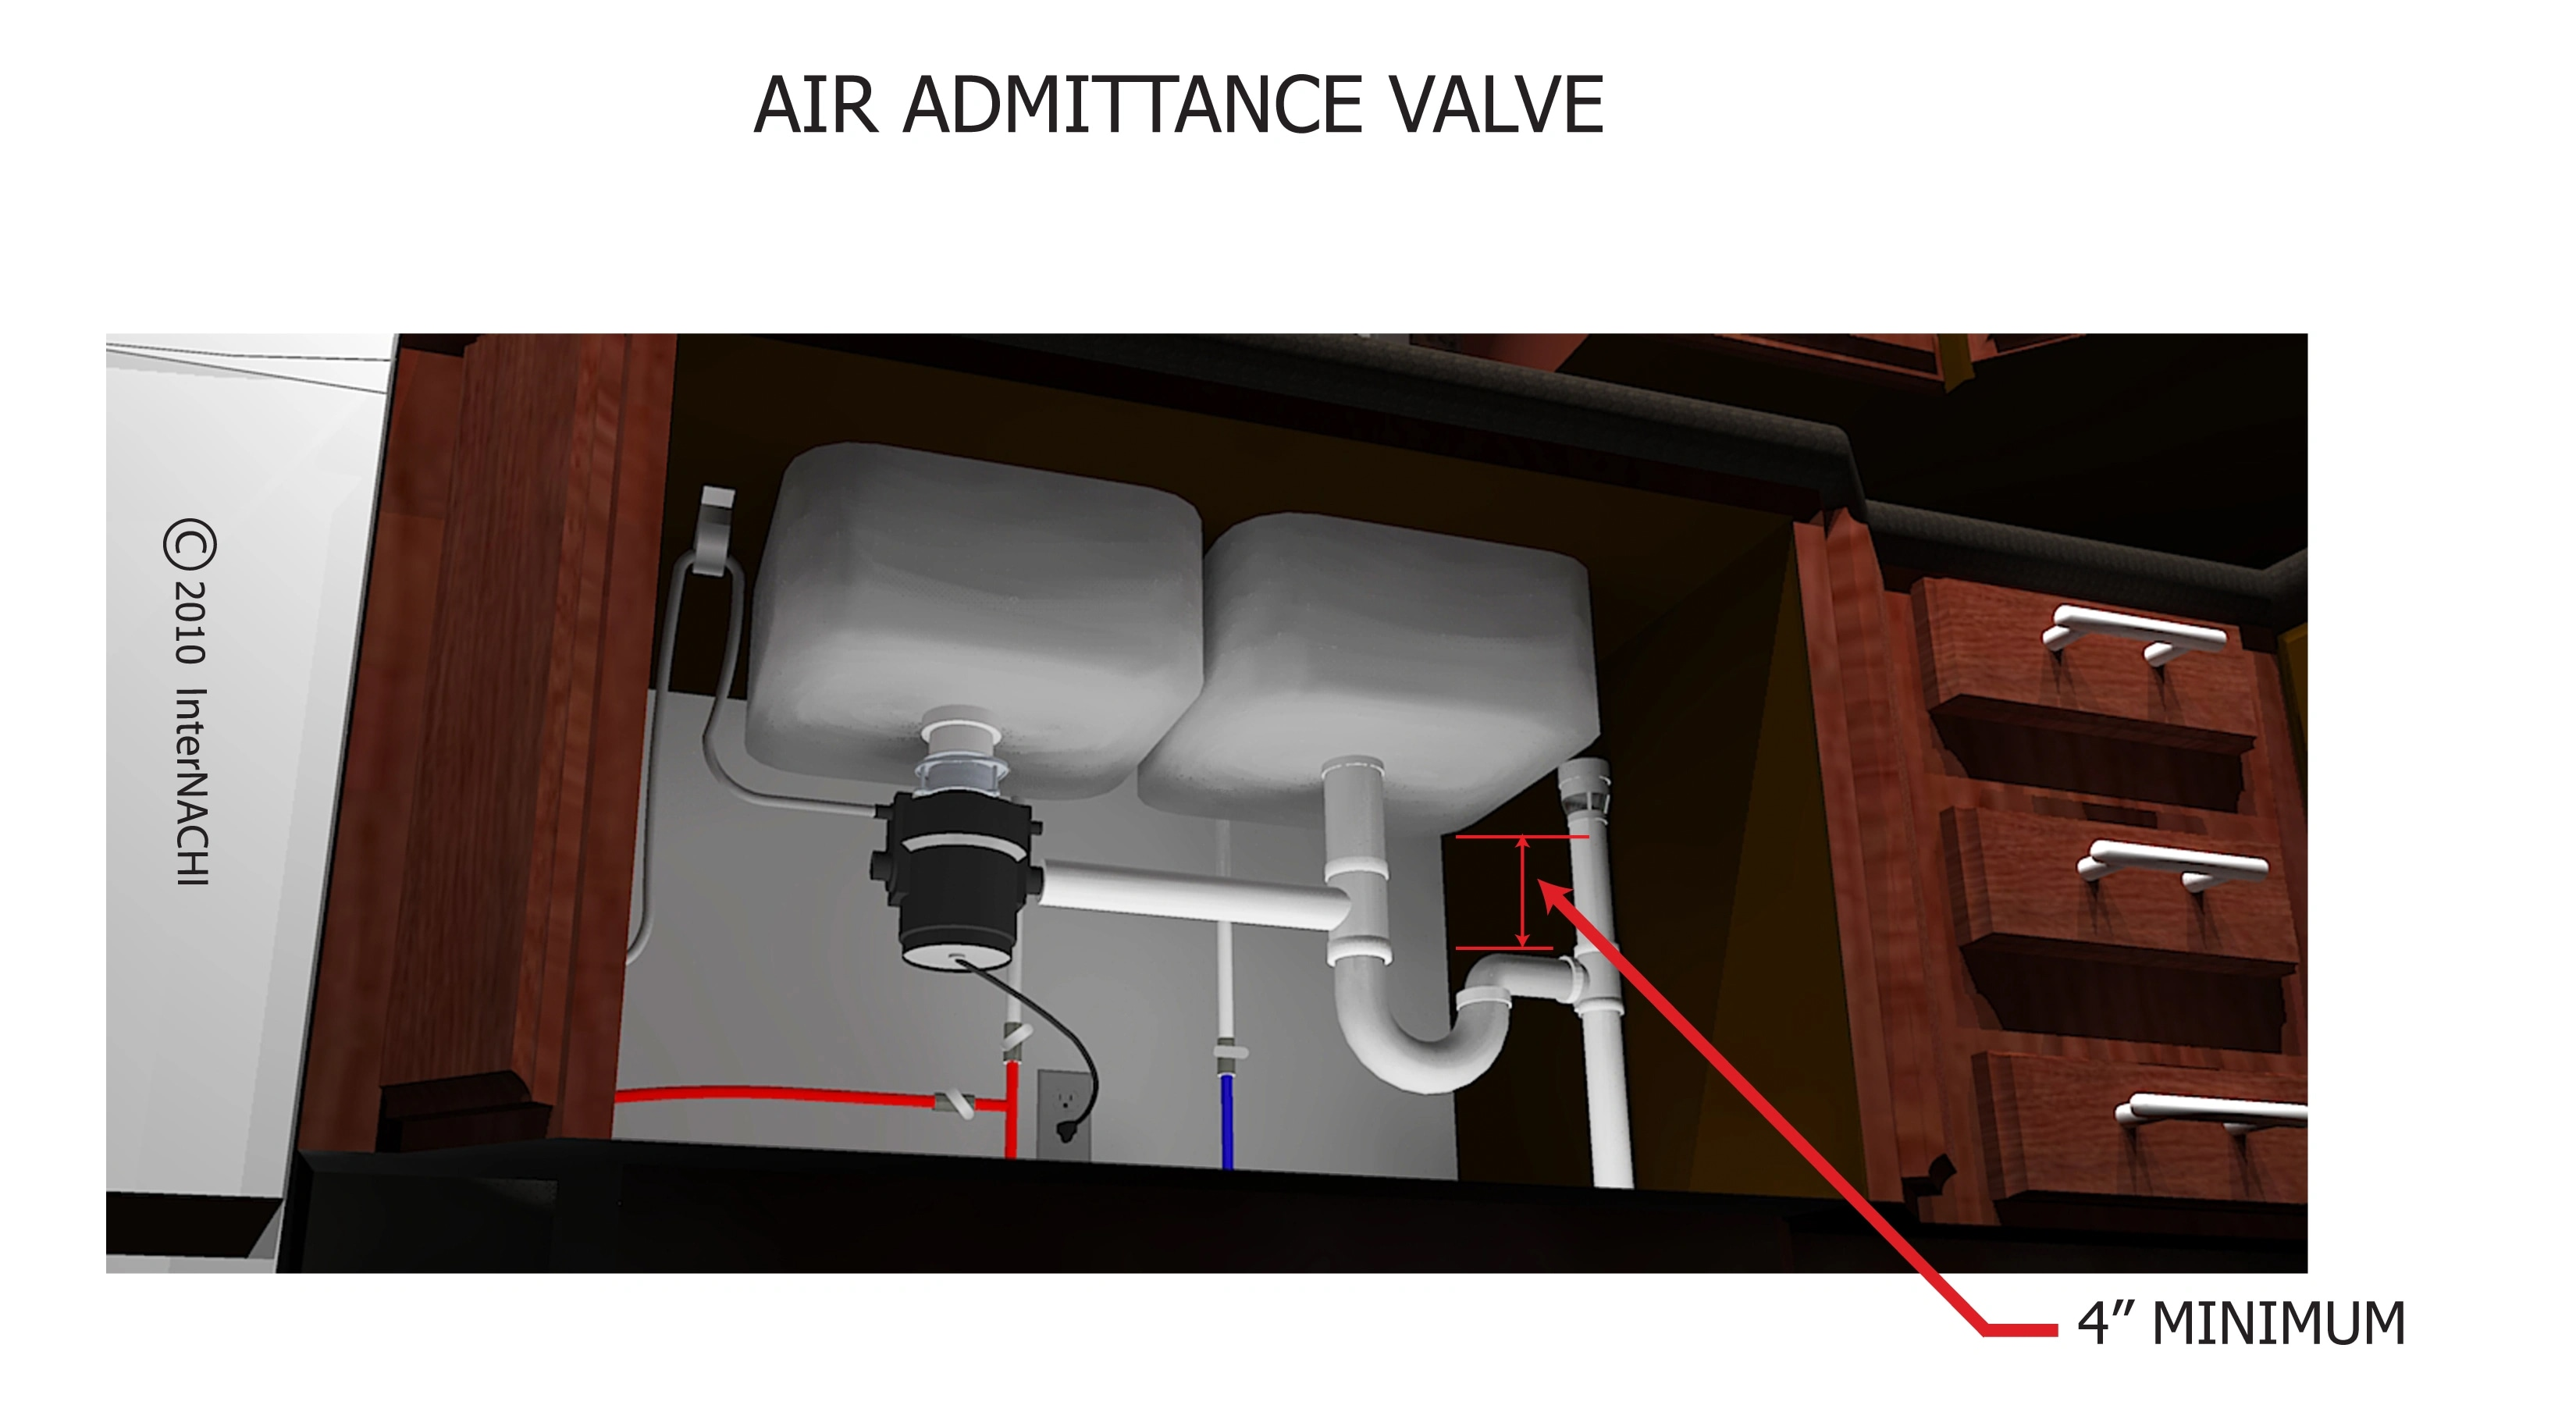 Air admittance valve.